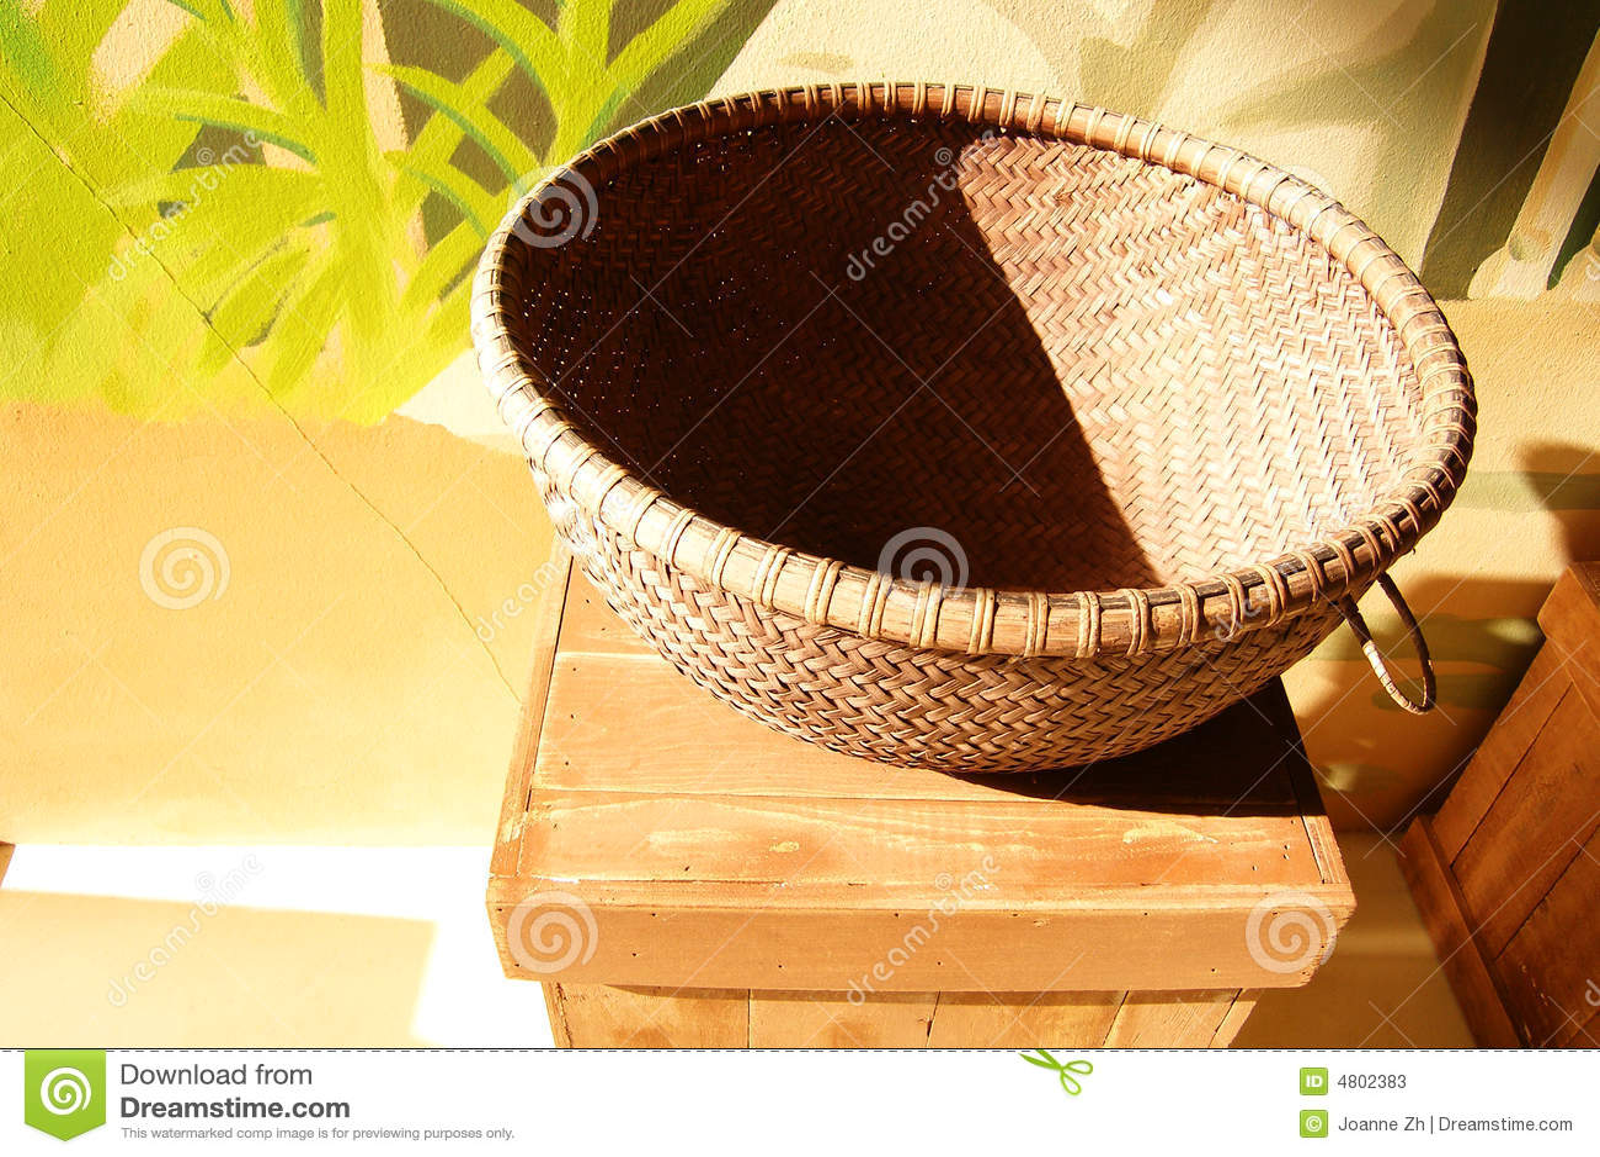 Basket in the sunlight